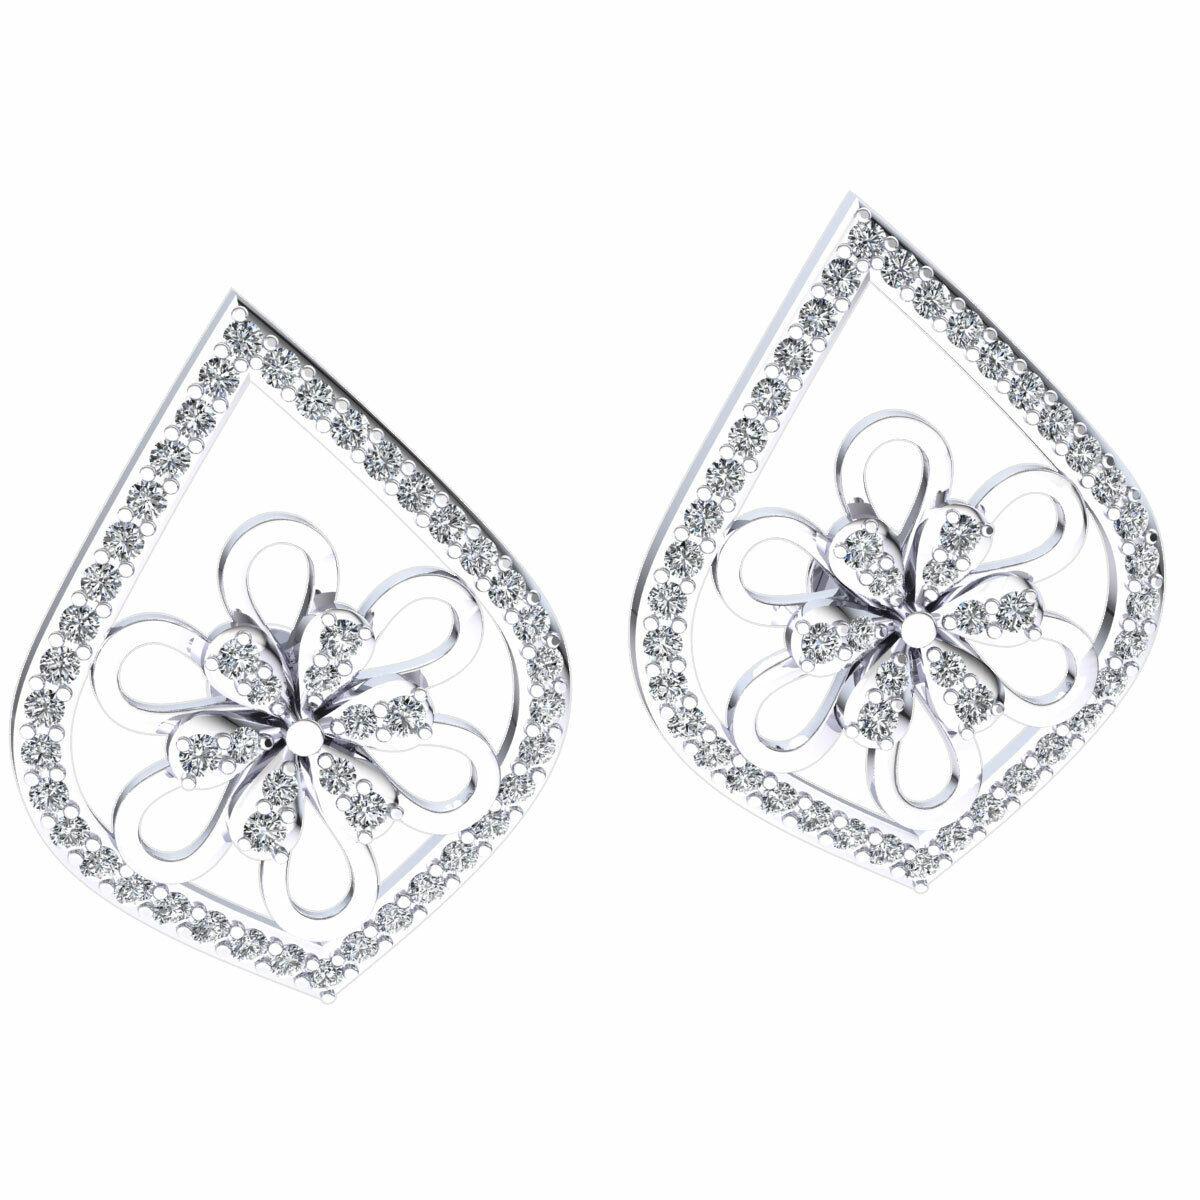 Genuine 0.8ct Round Cut Diamond Ladies Halo Flower Earrings Solid 10K gold